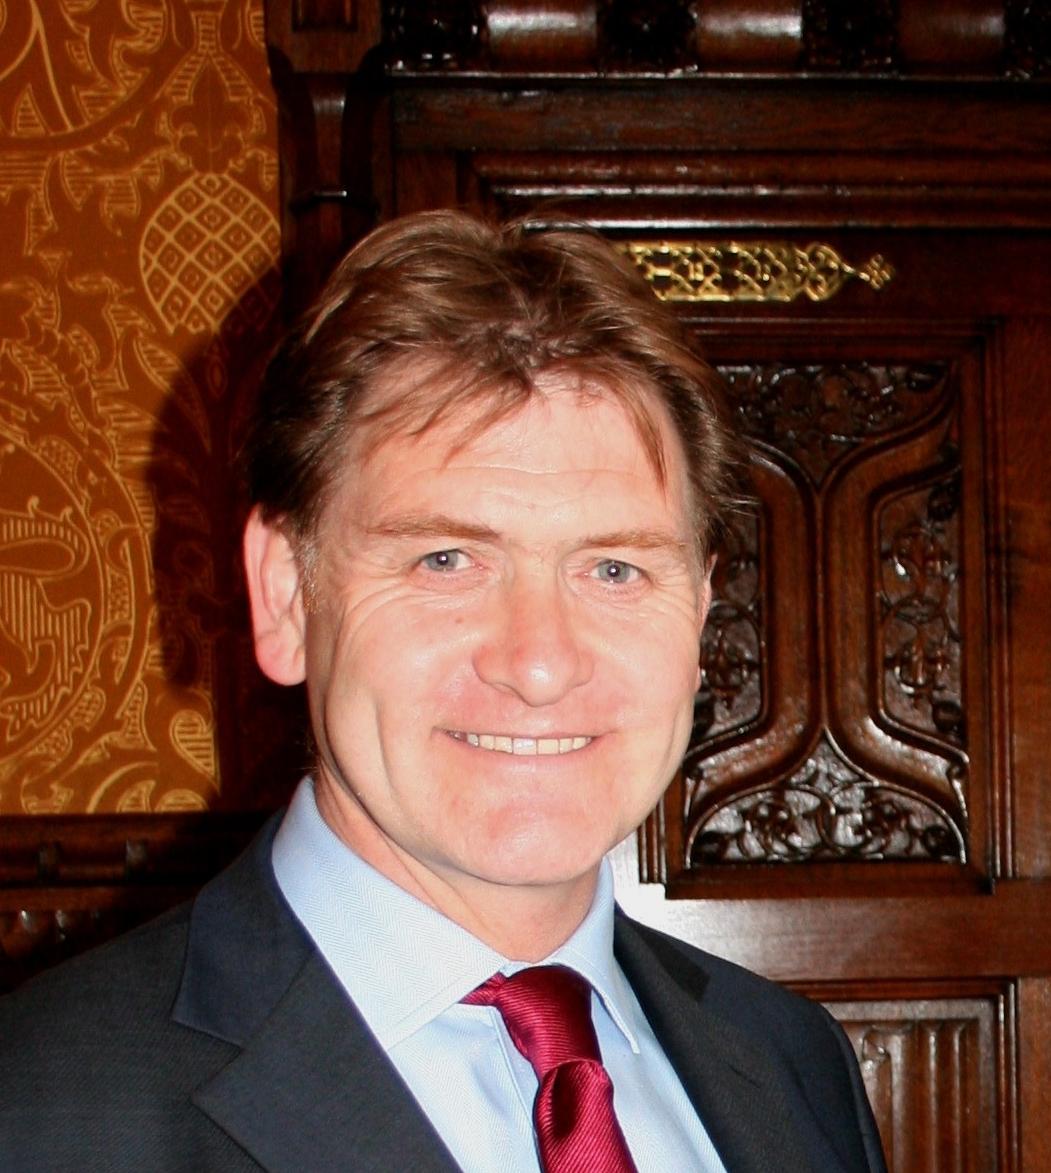 File:Eric JOYCE MP June 2008.JPG - Wikipedia